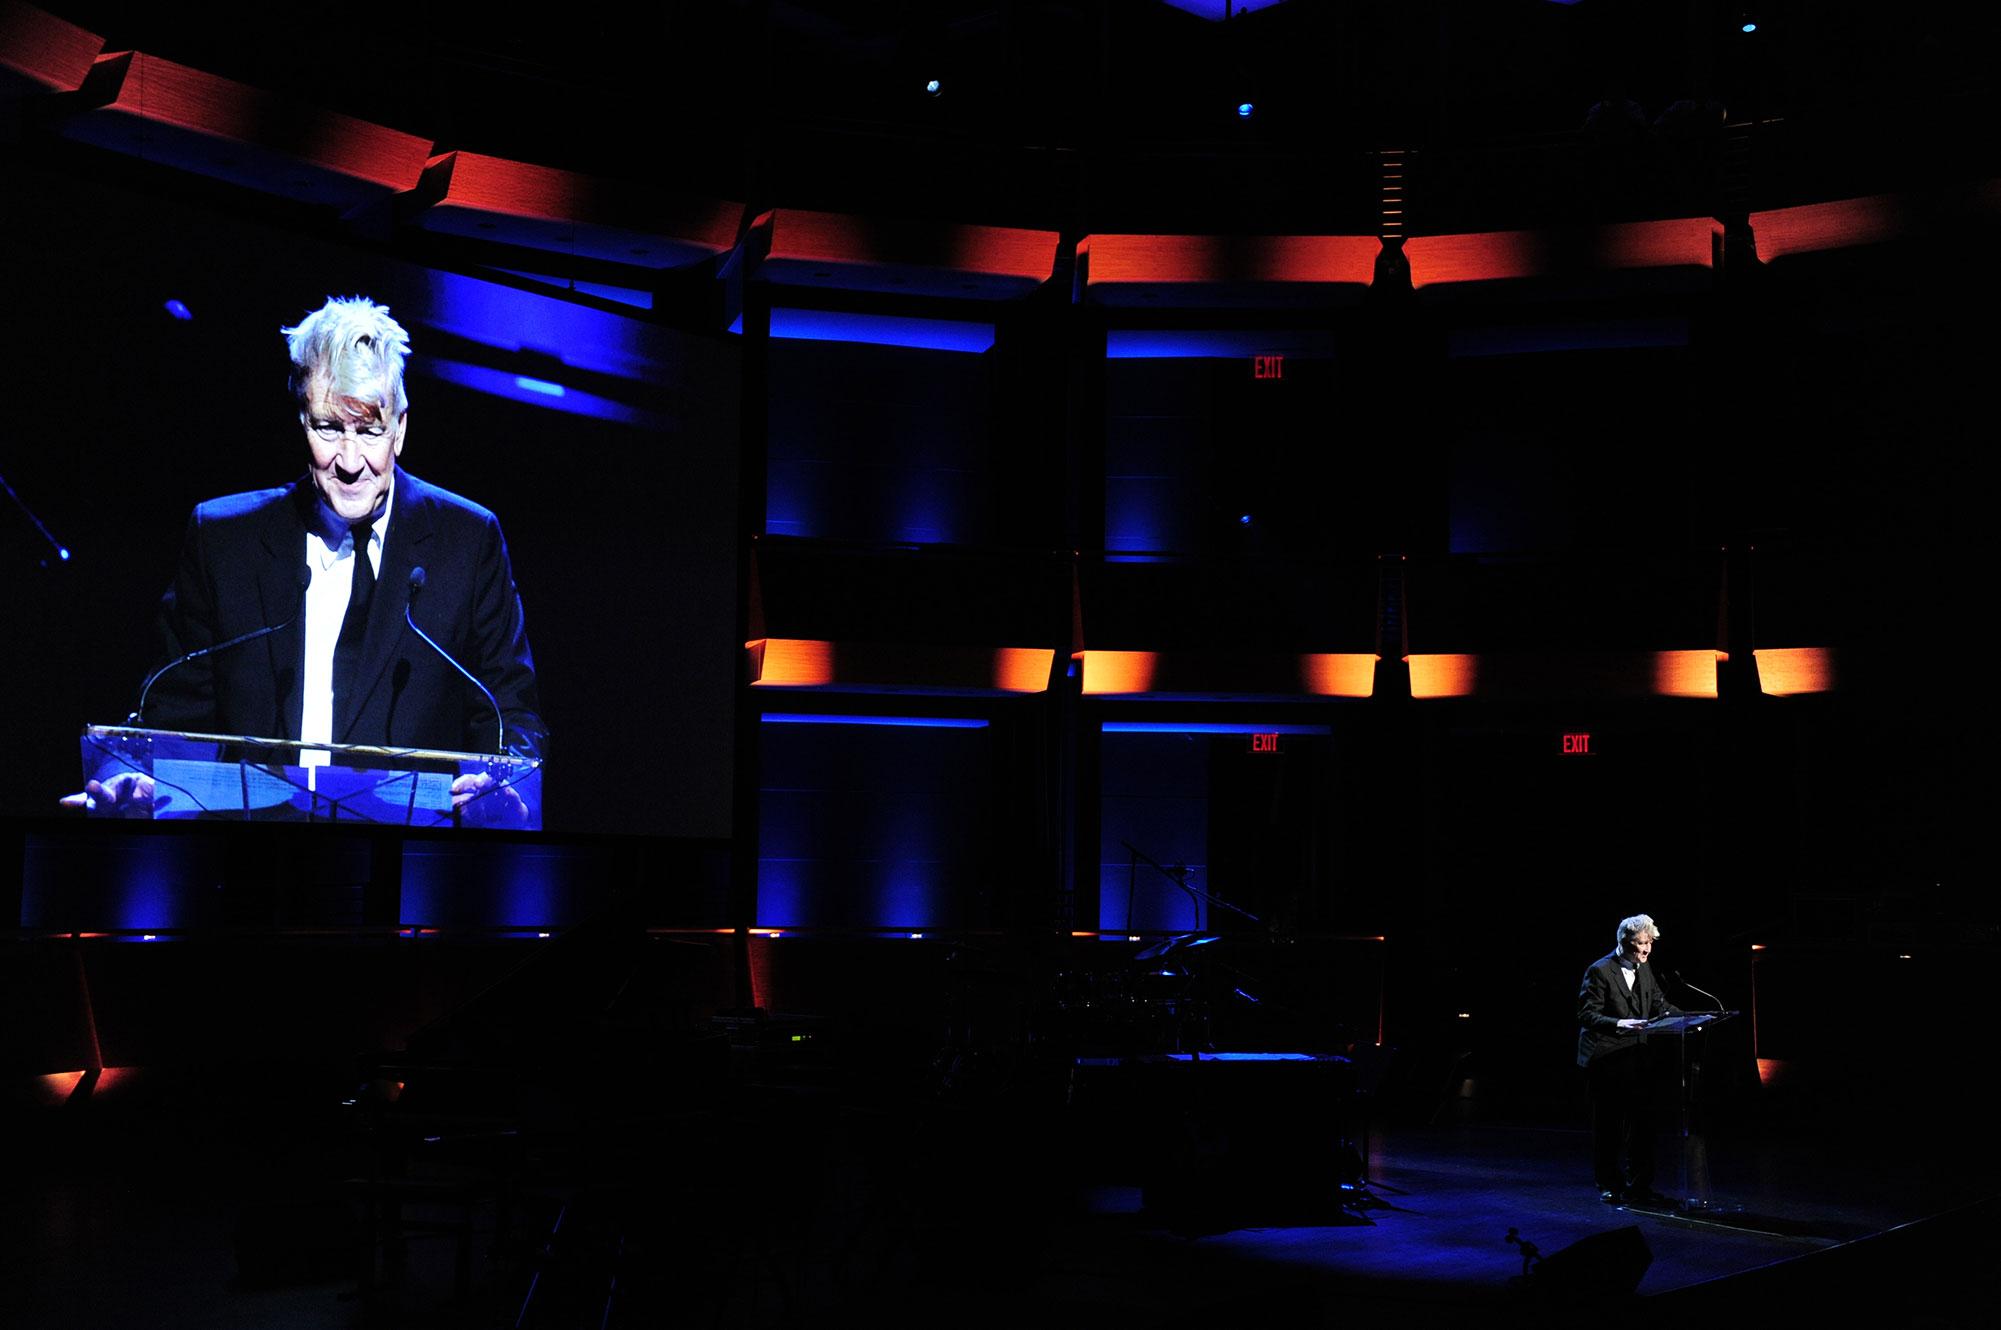 David Lynch Speaks at a David Lynch Foundation Event